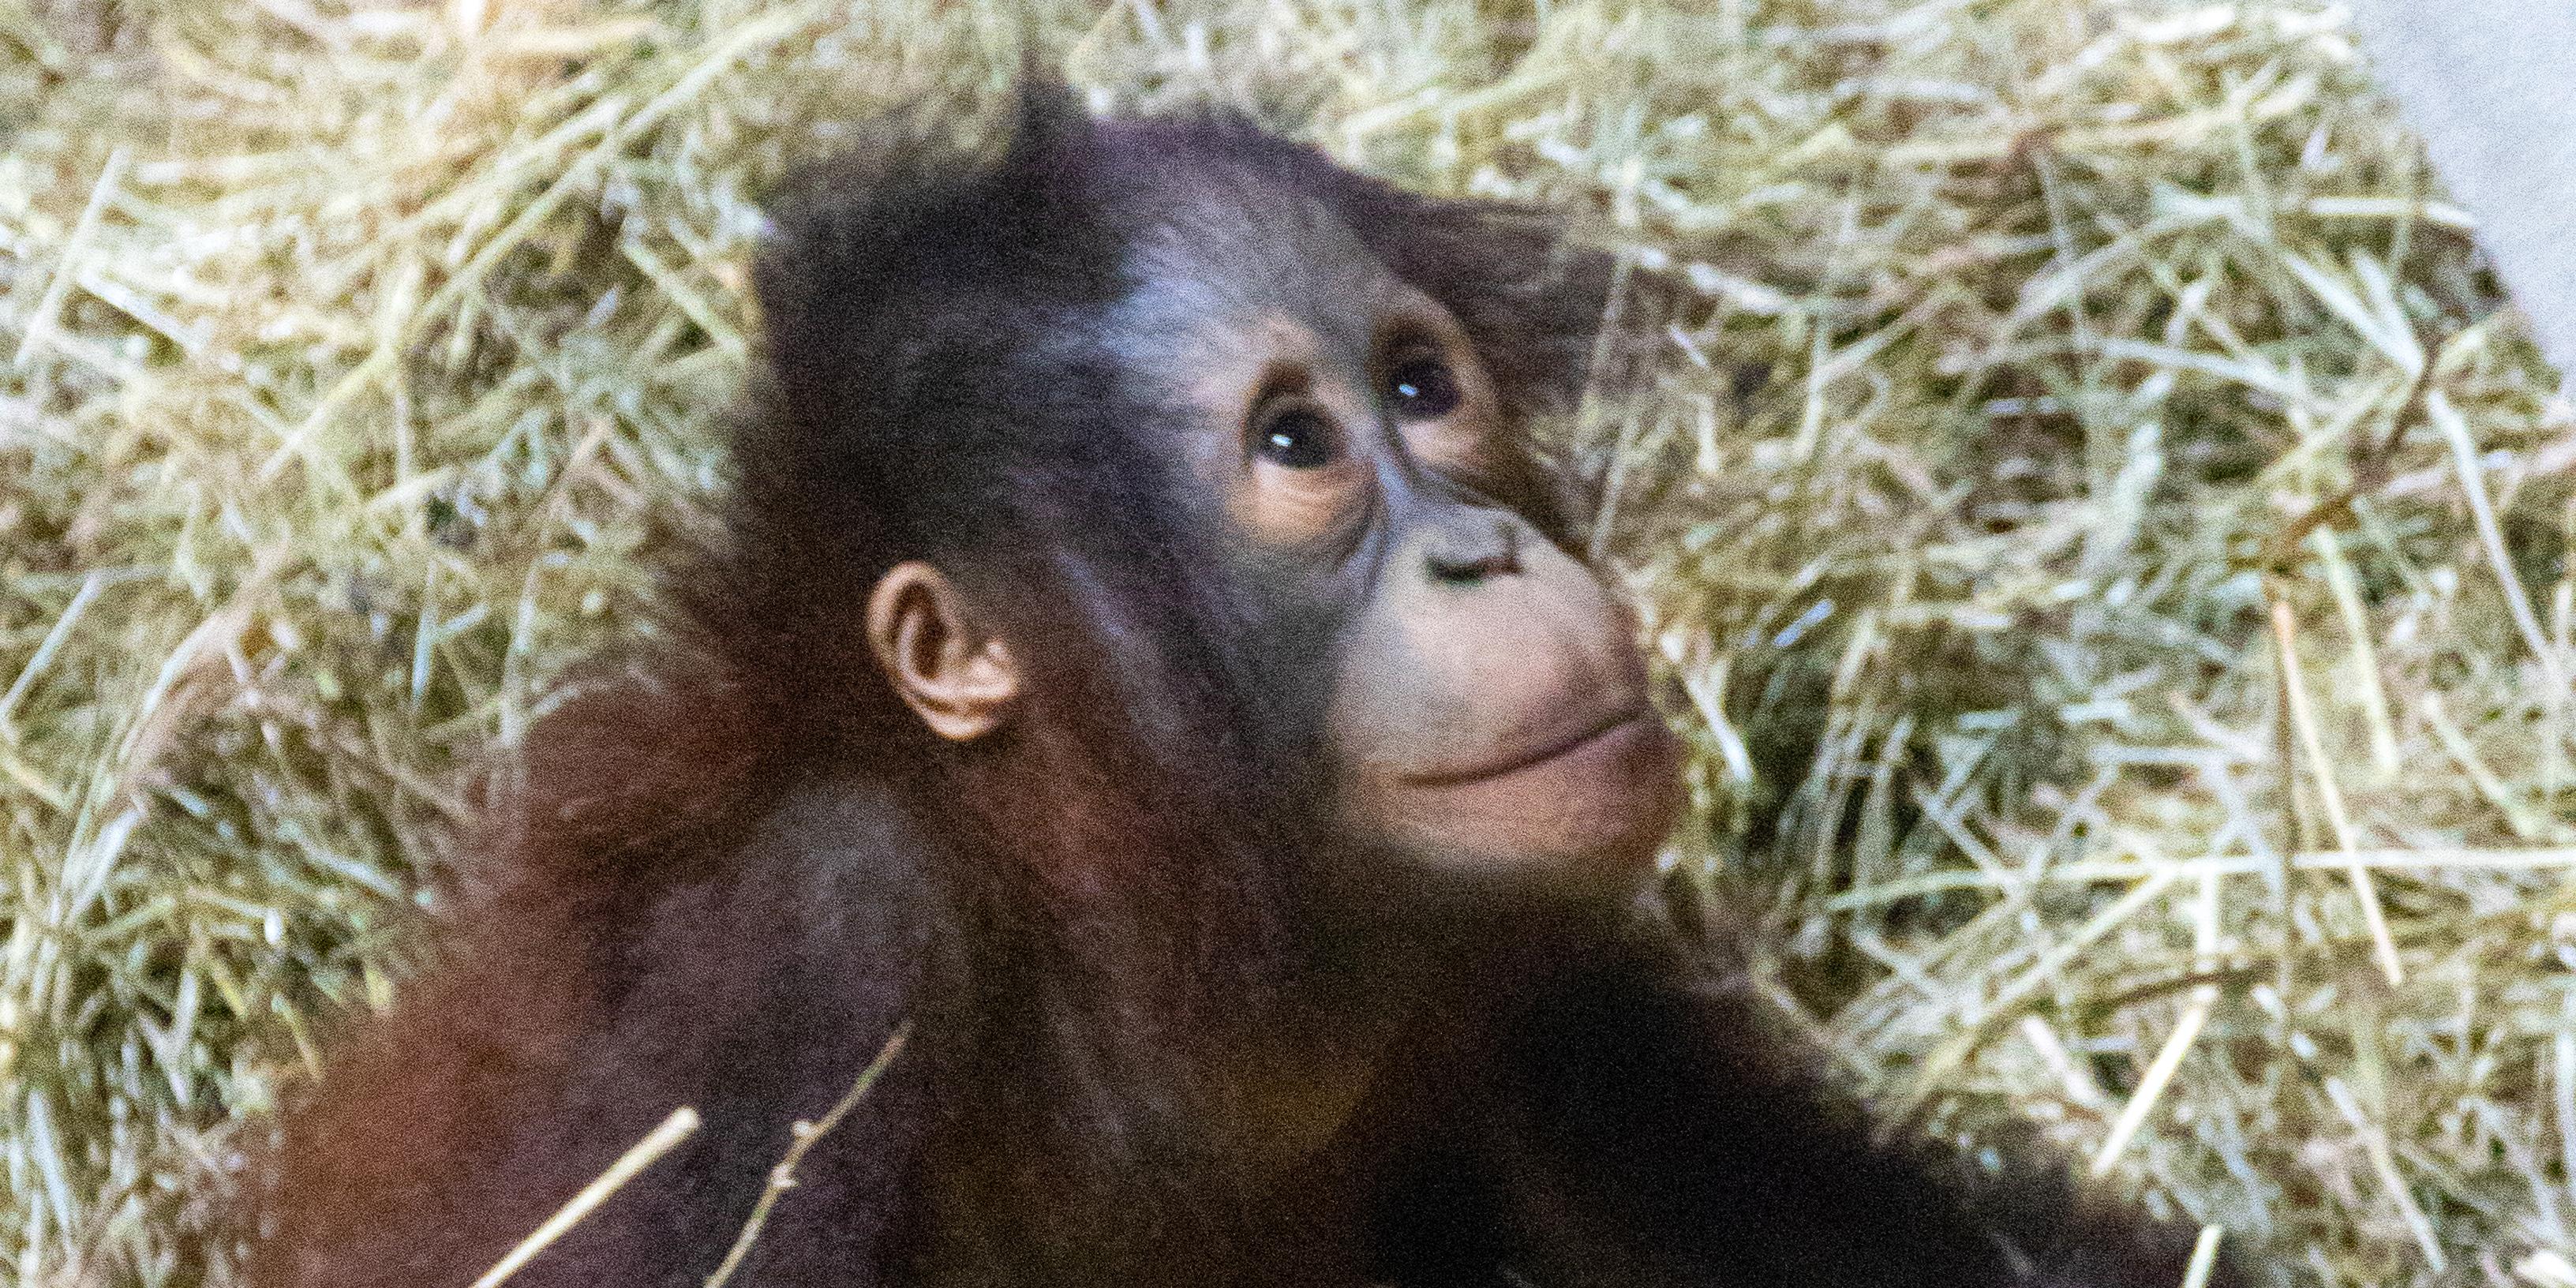 Bornean orangutan infant Redd at 22 months old.